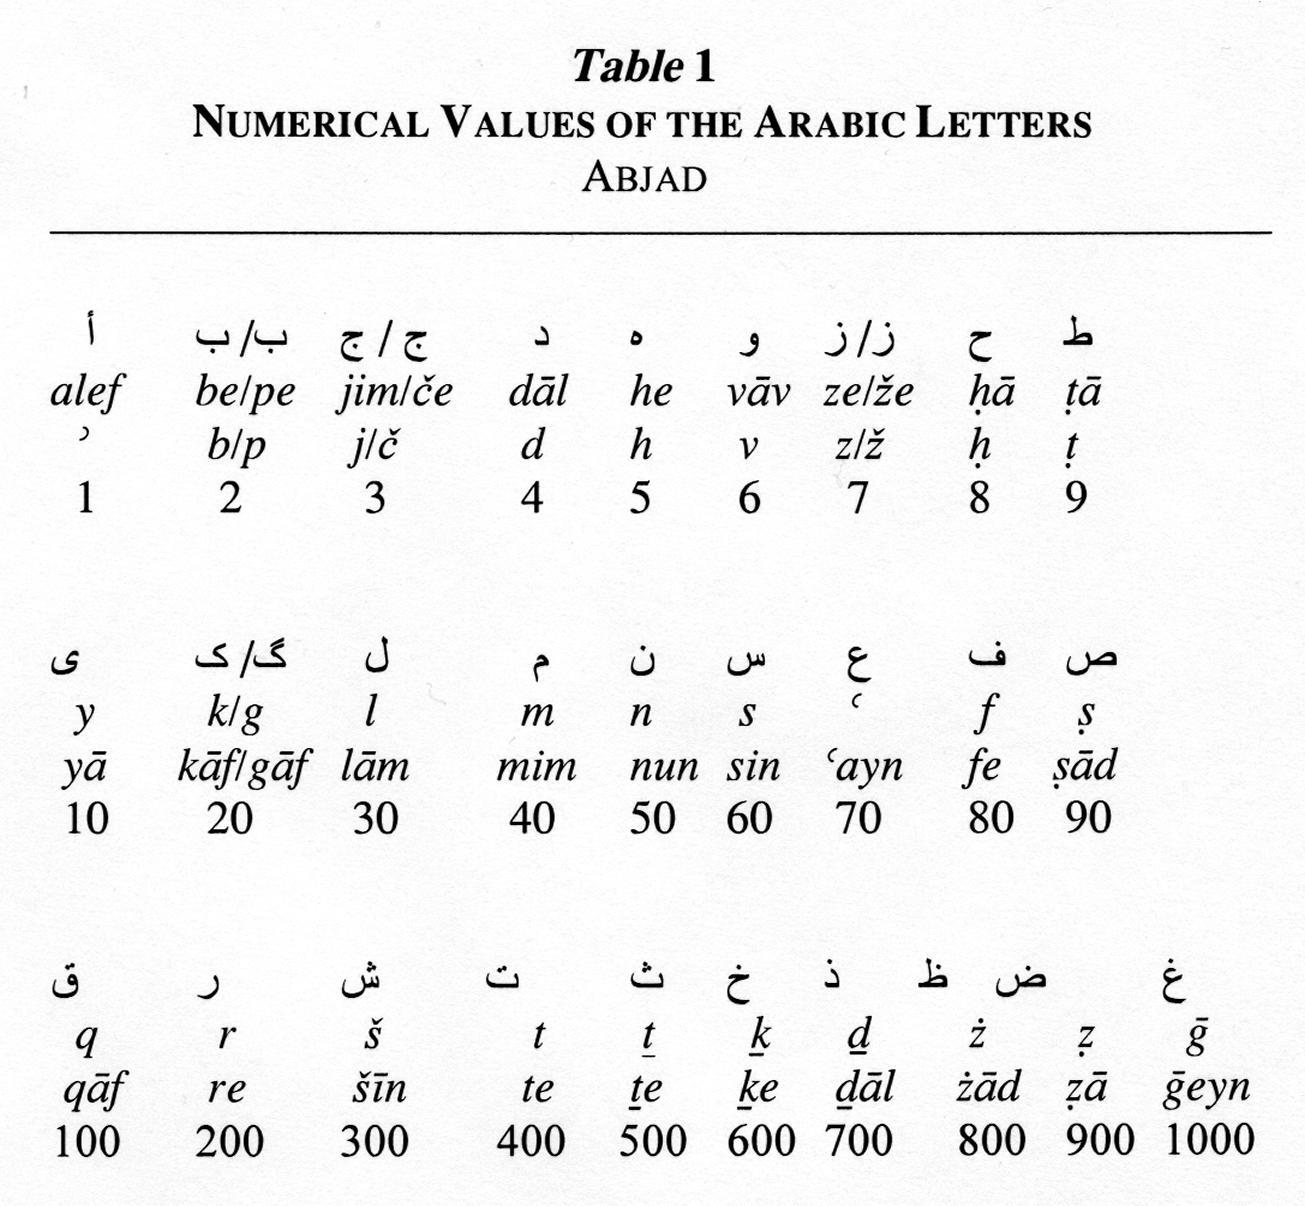 Jafr Encyclopaedia Iranica